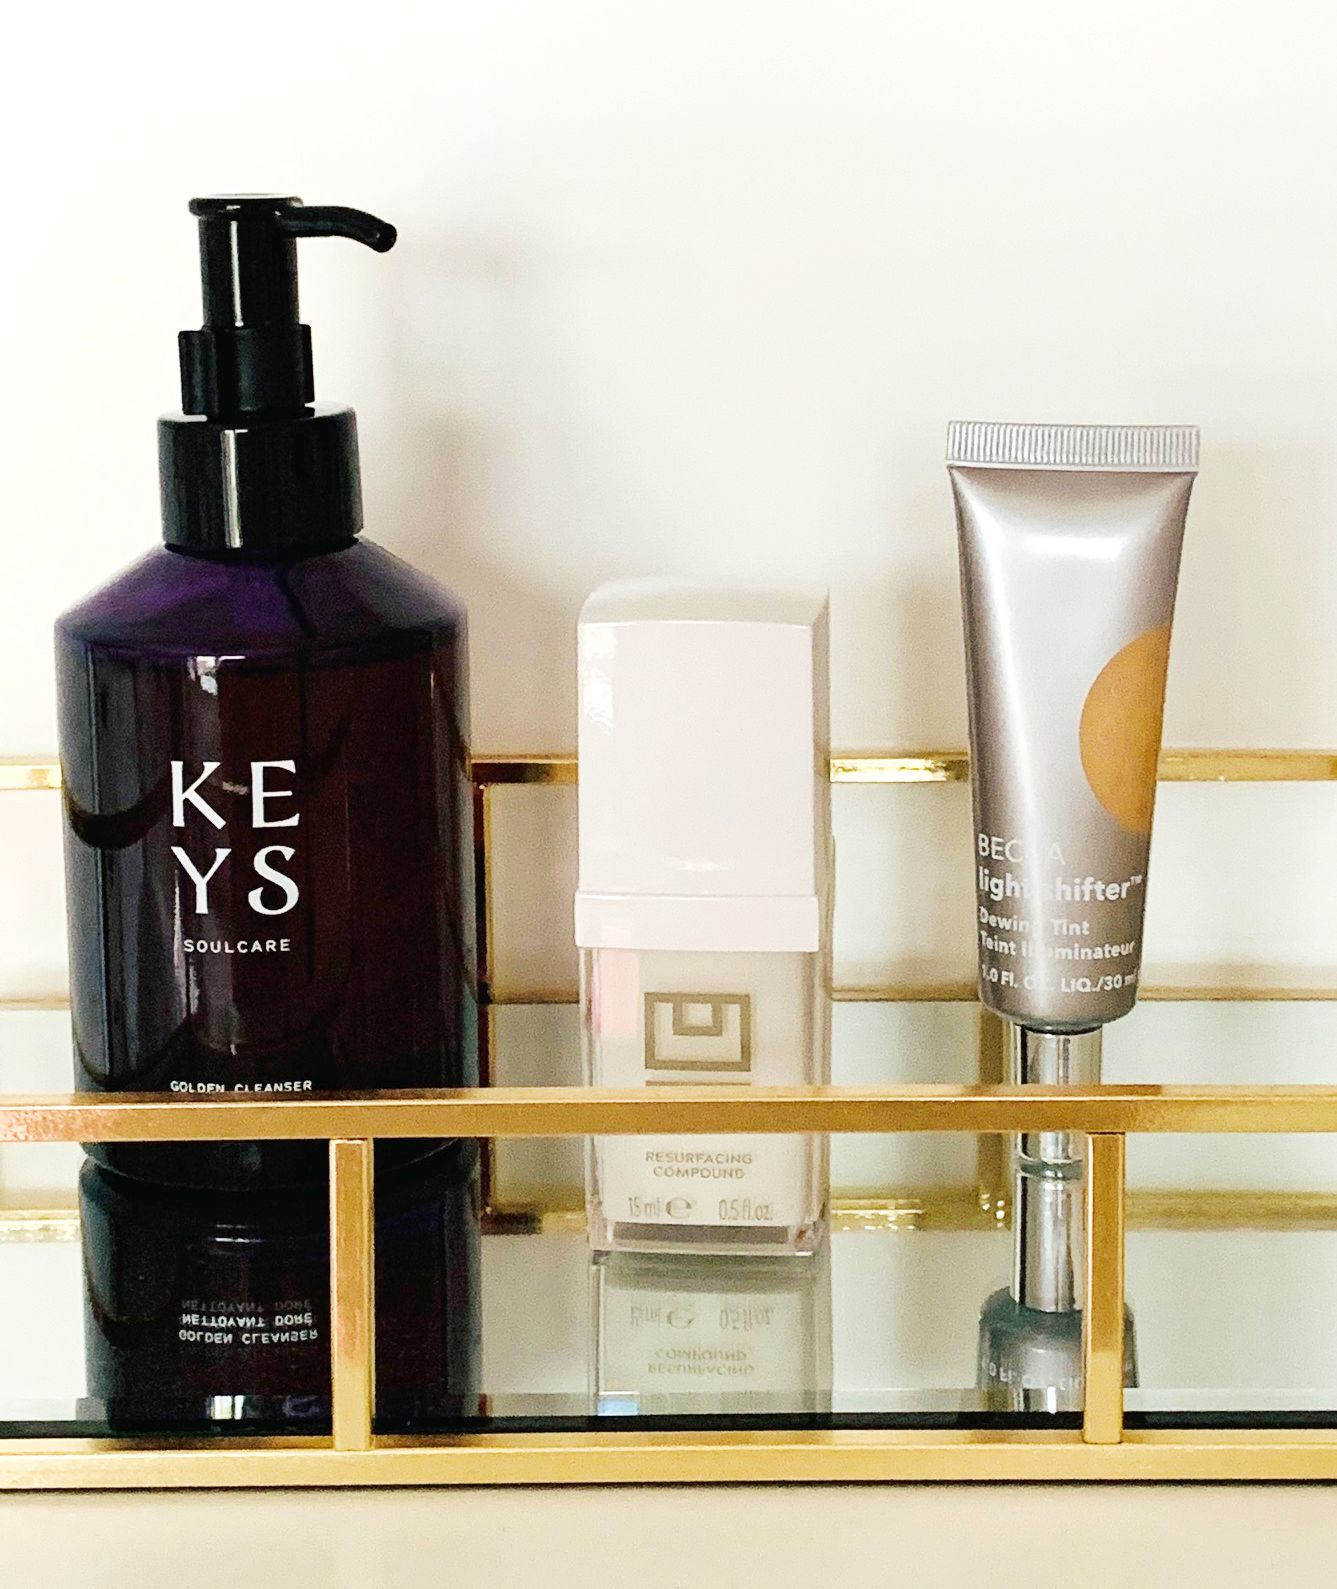 U Beauty Resurfacing Compound,3 treats for 3 budgets,Keys Skincare Golden Cleanser,BECCA Tinted Moisturiser,